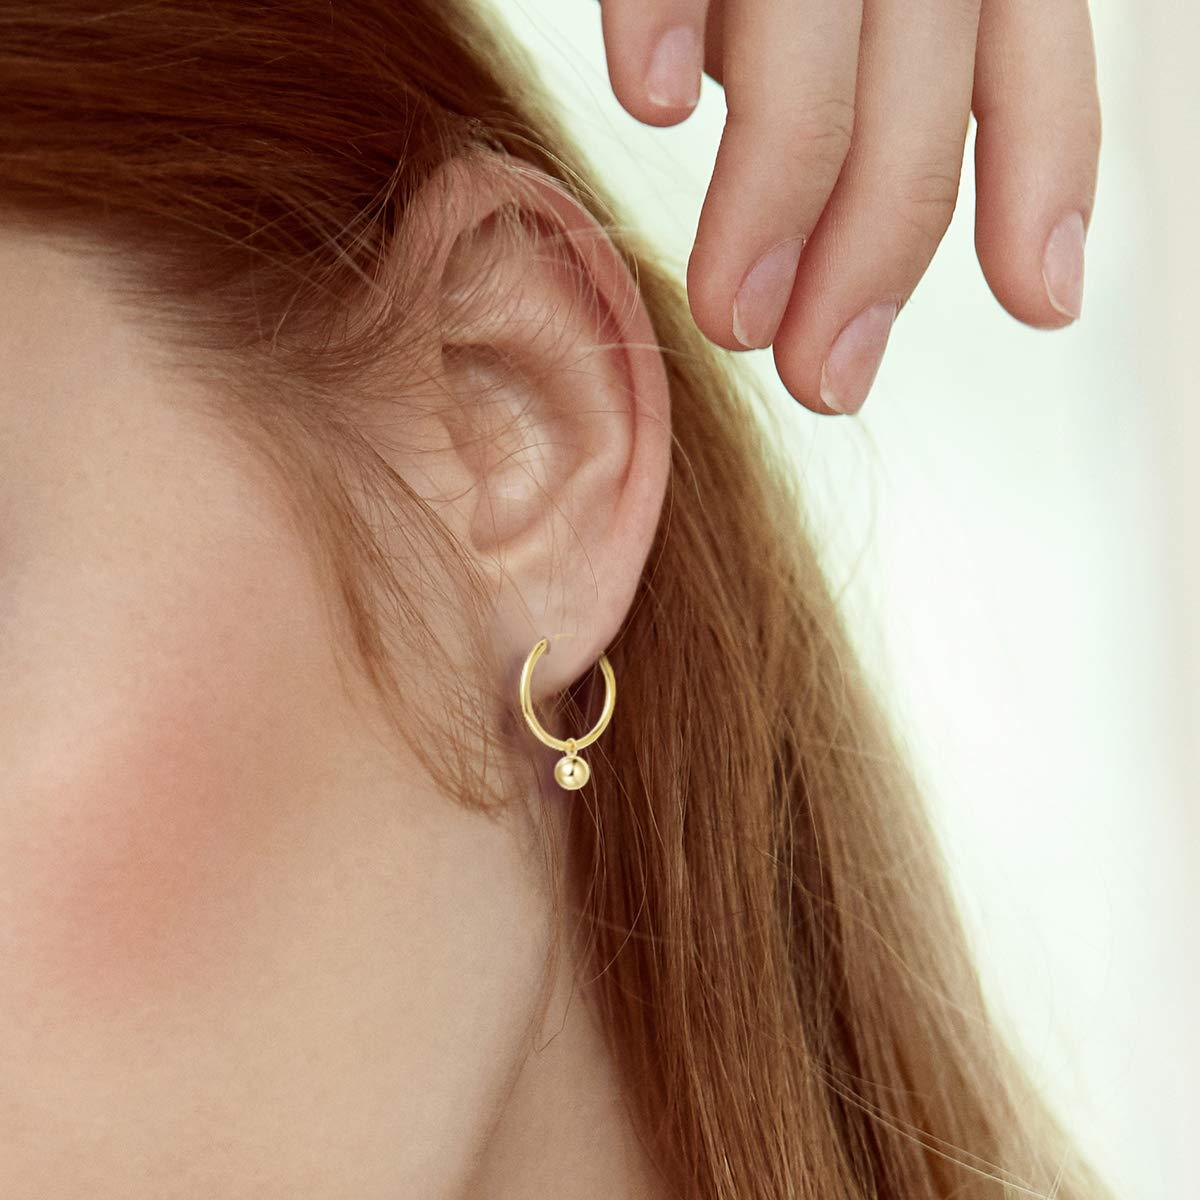 FANCIME Yellow Gold Plated 925 Sterling Silver Round Dangle Drop Hoop Earrings Dainty Fine Jewelry For Women Girls